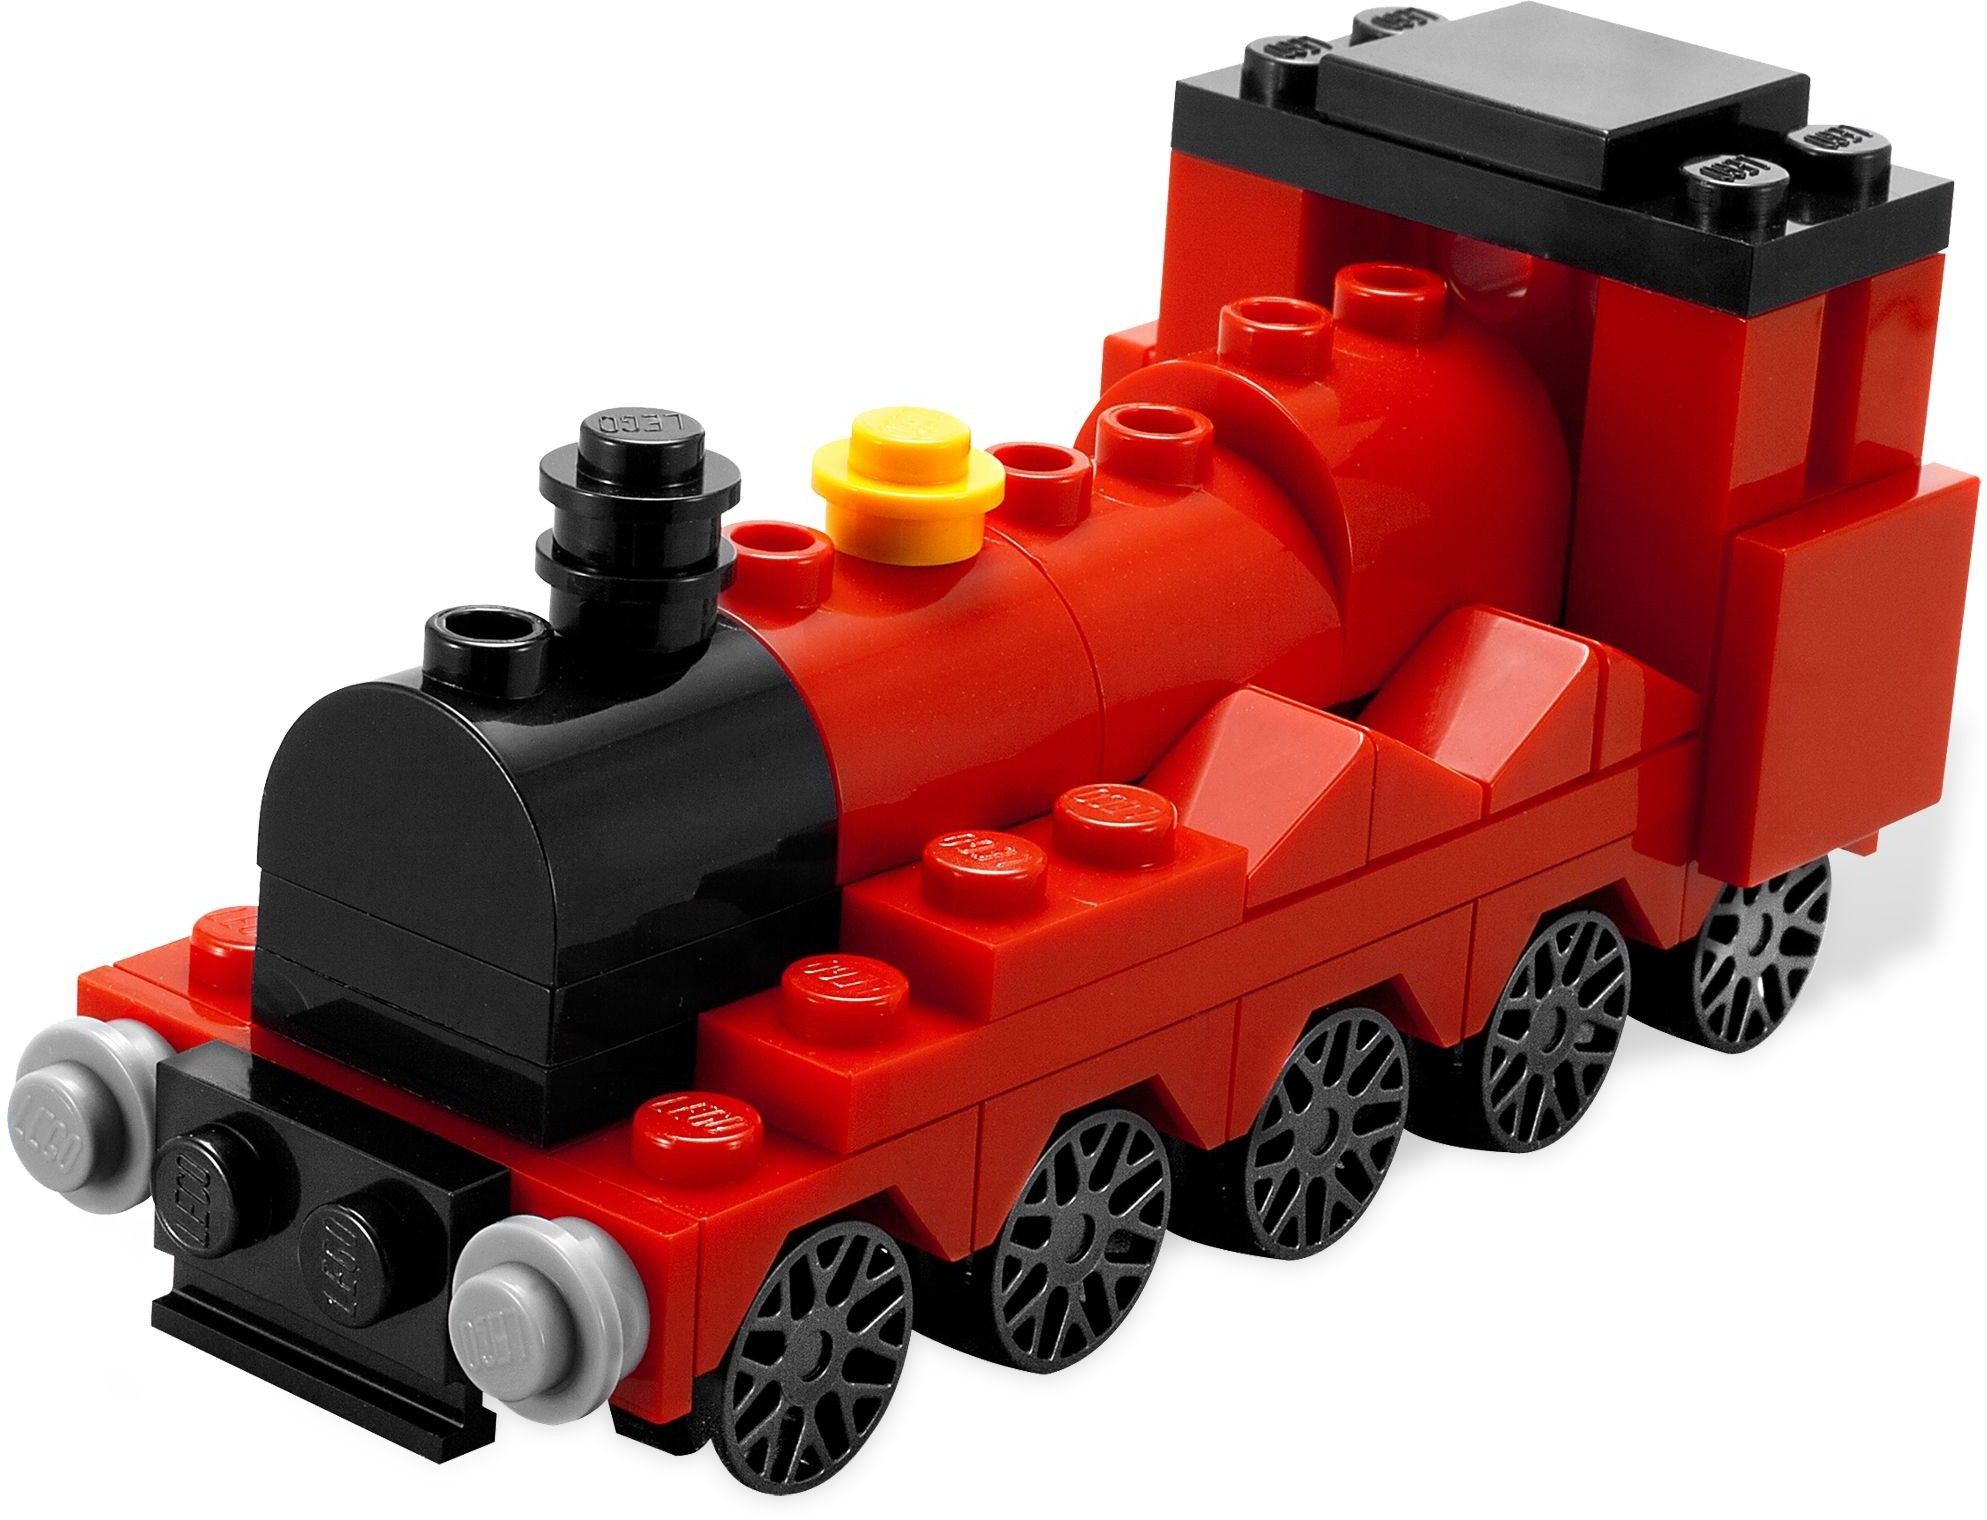 40028 Mini Hogwarts Express Lego Harry Potter Hogwarts Express Harry Potter Lego Sets